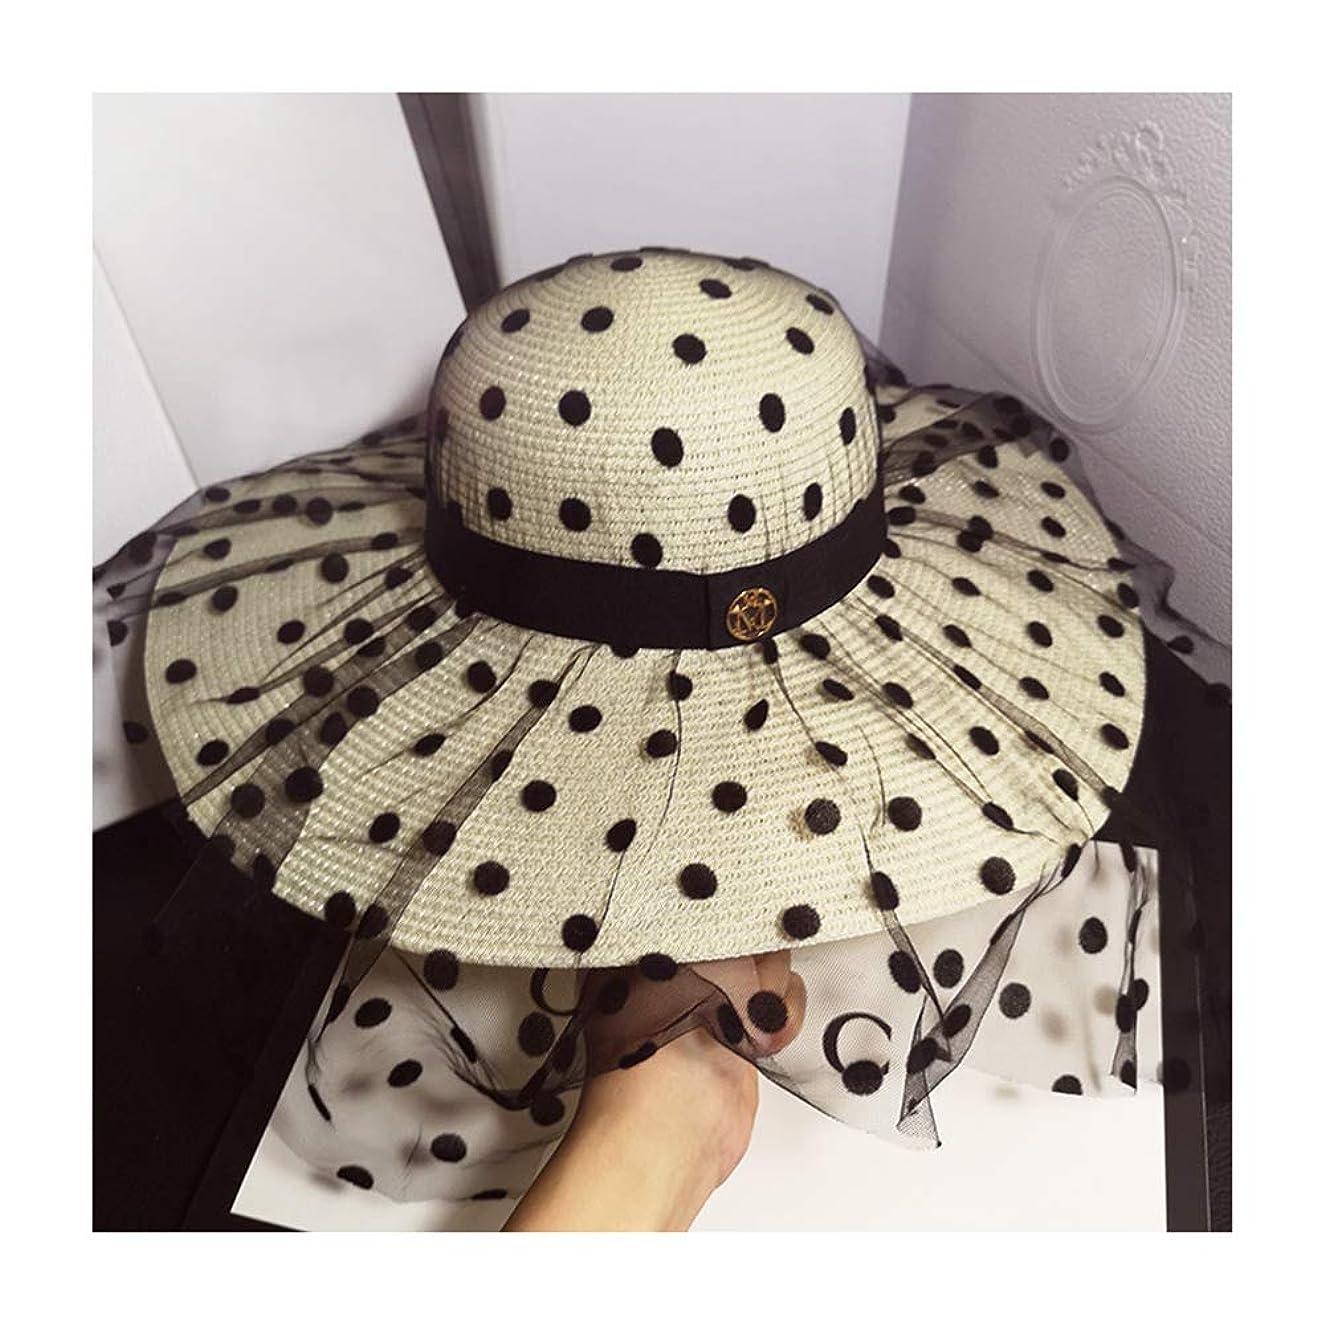 QTKJ Summer Anti-UV Round Top Sun Straw Beach Hat with M Letter, Adjustable Travel Wide Brim Black Lace Visor Hats with Black Decorative Belt for Women (Milky White)